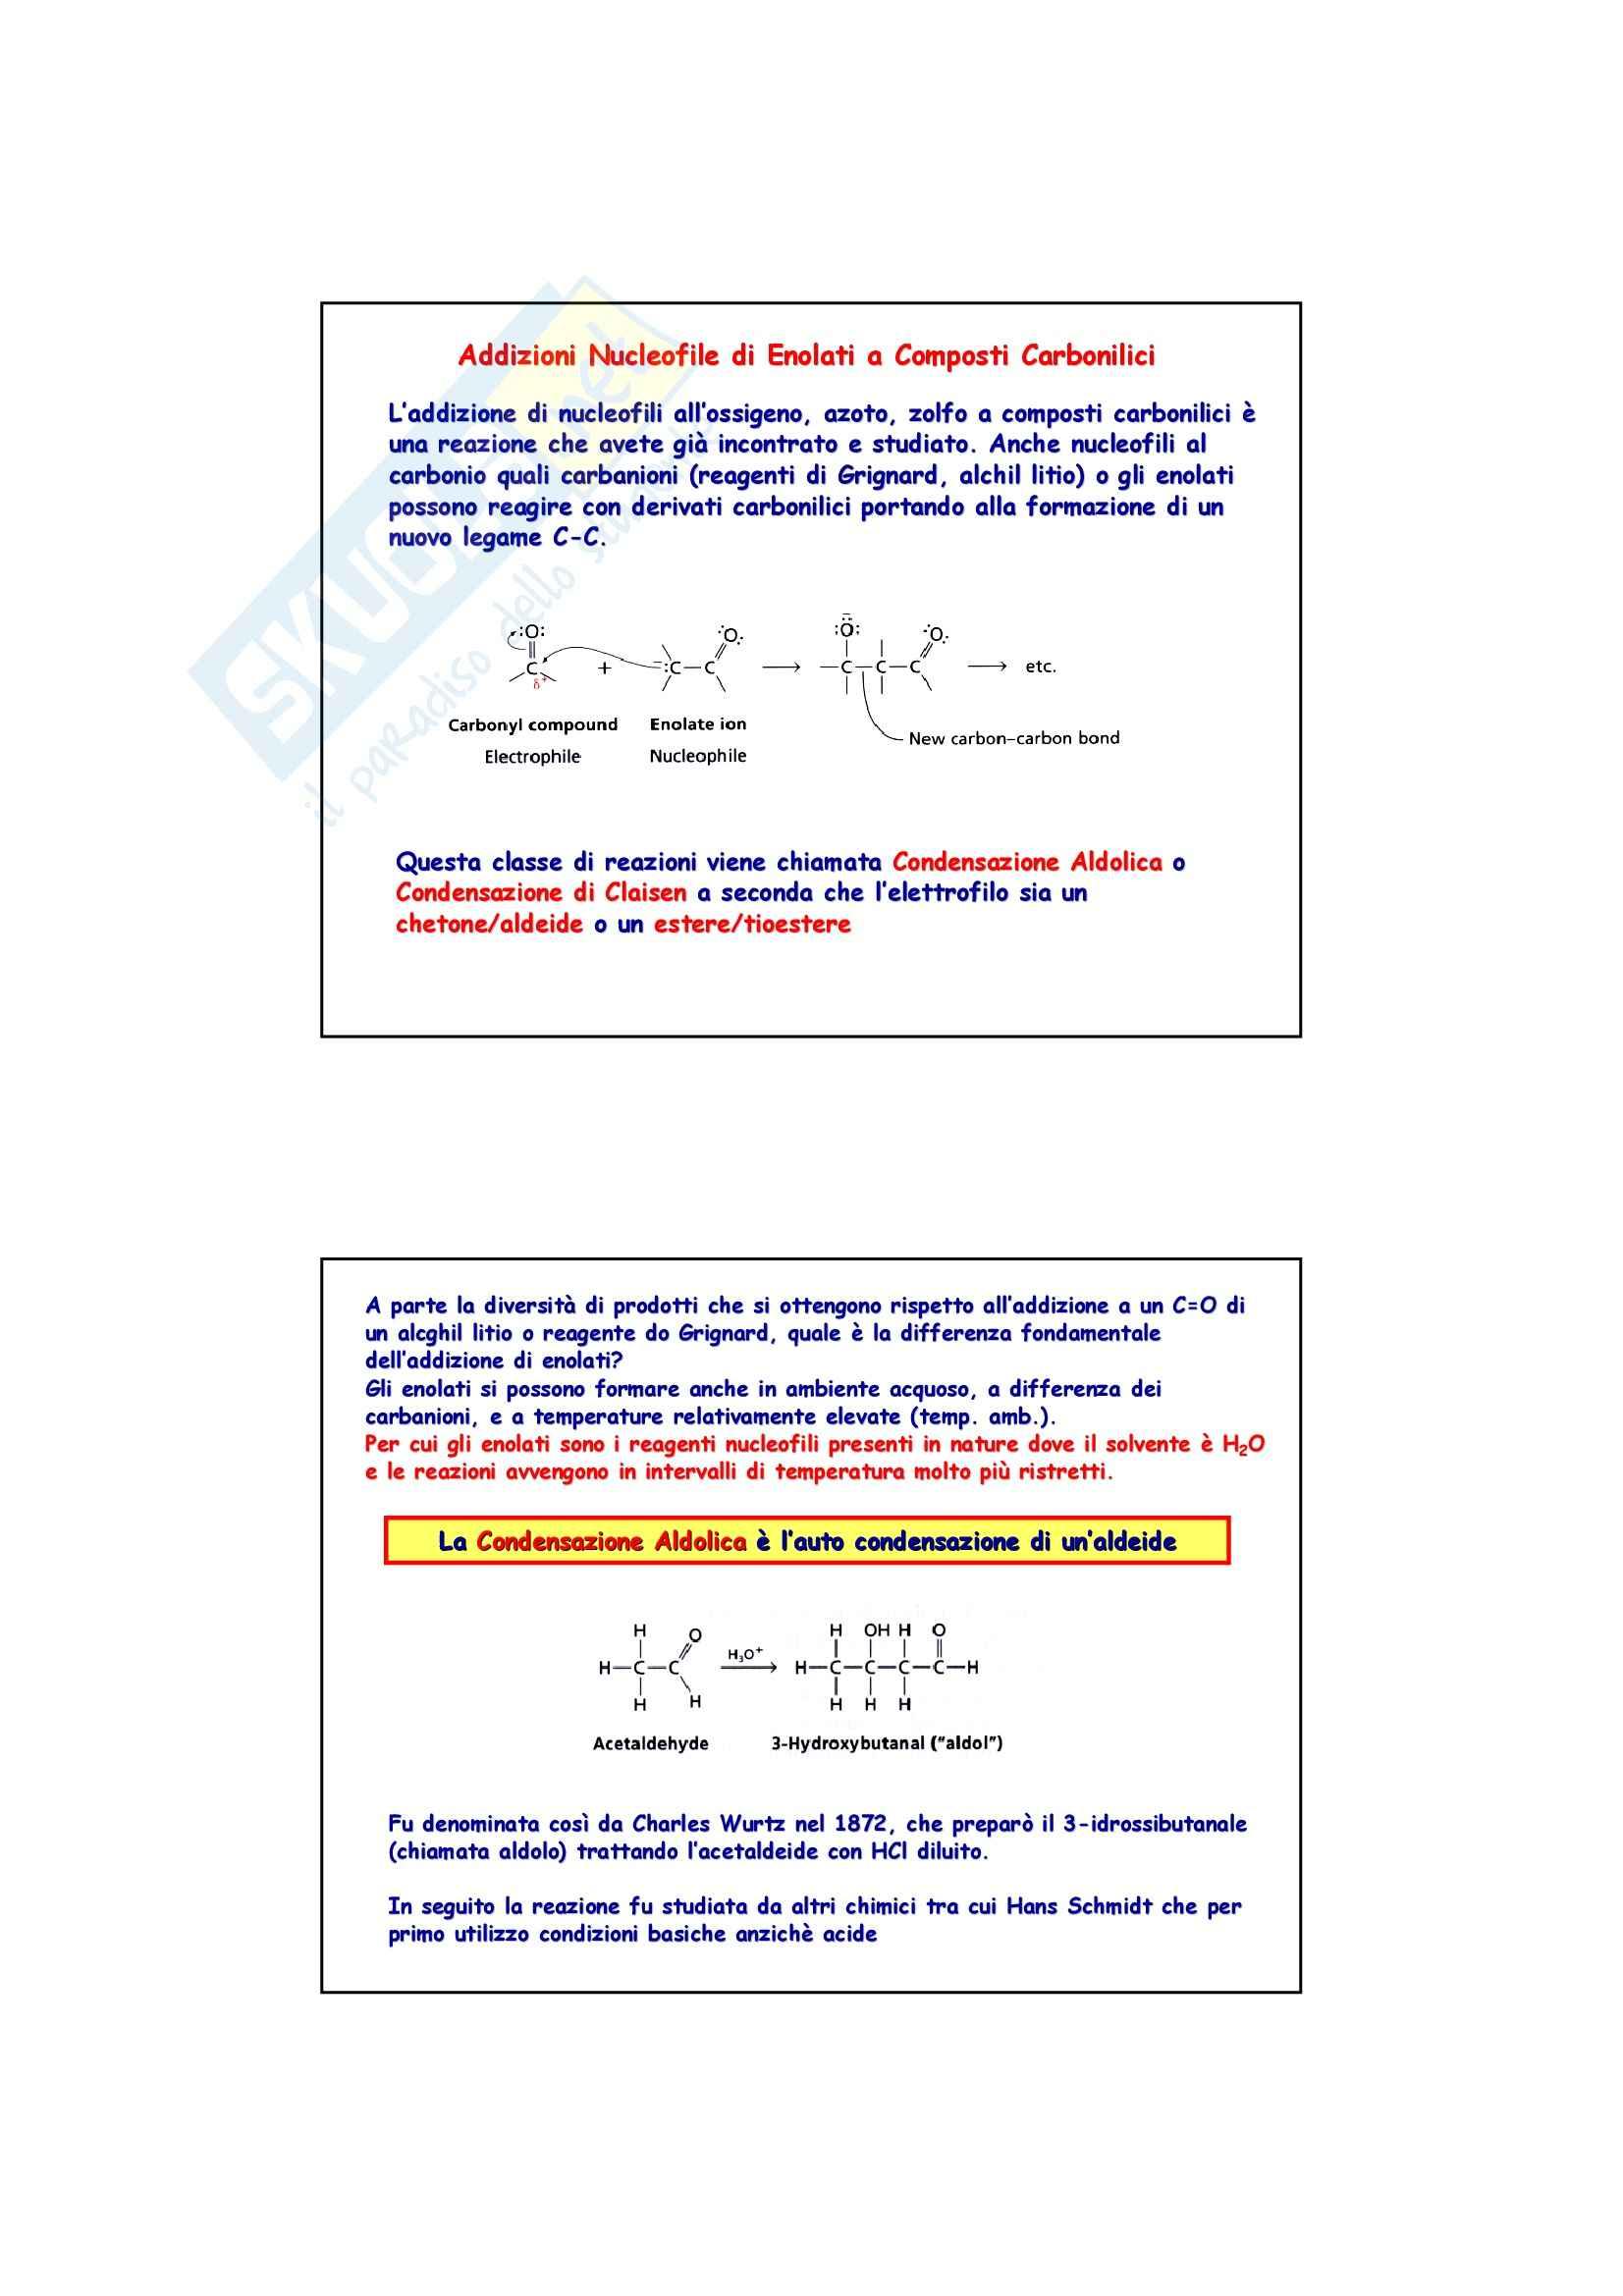 Chimica organica - Condensazione aldolica